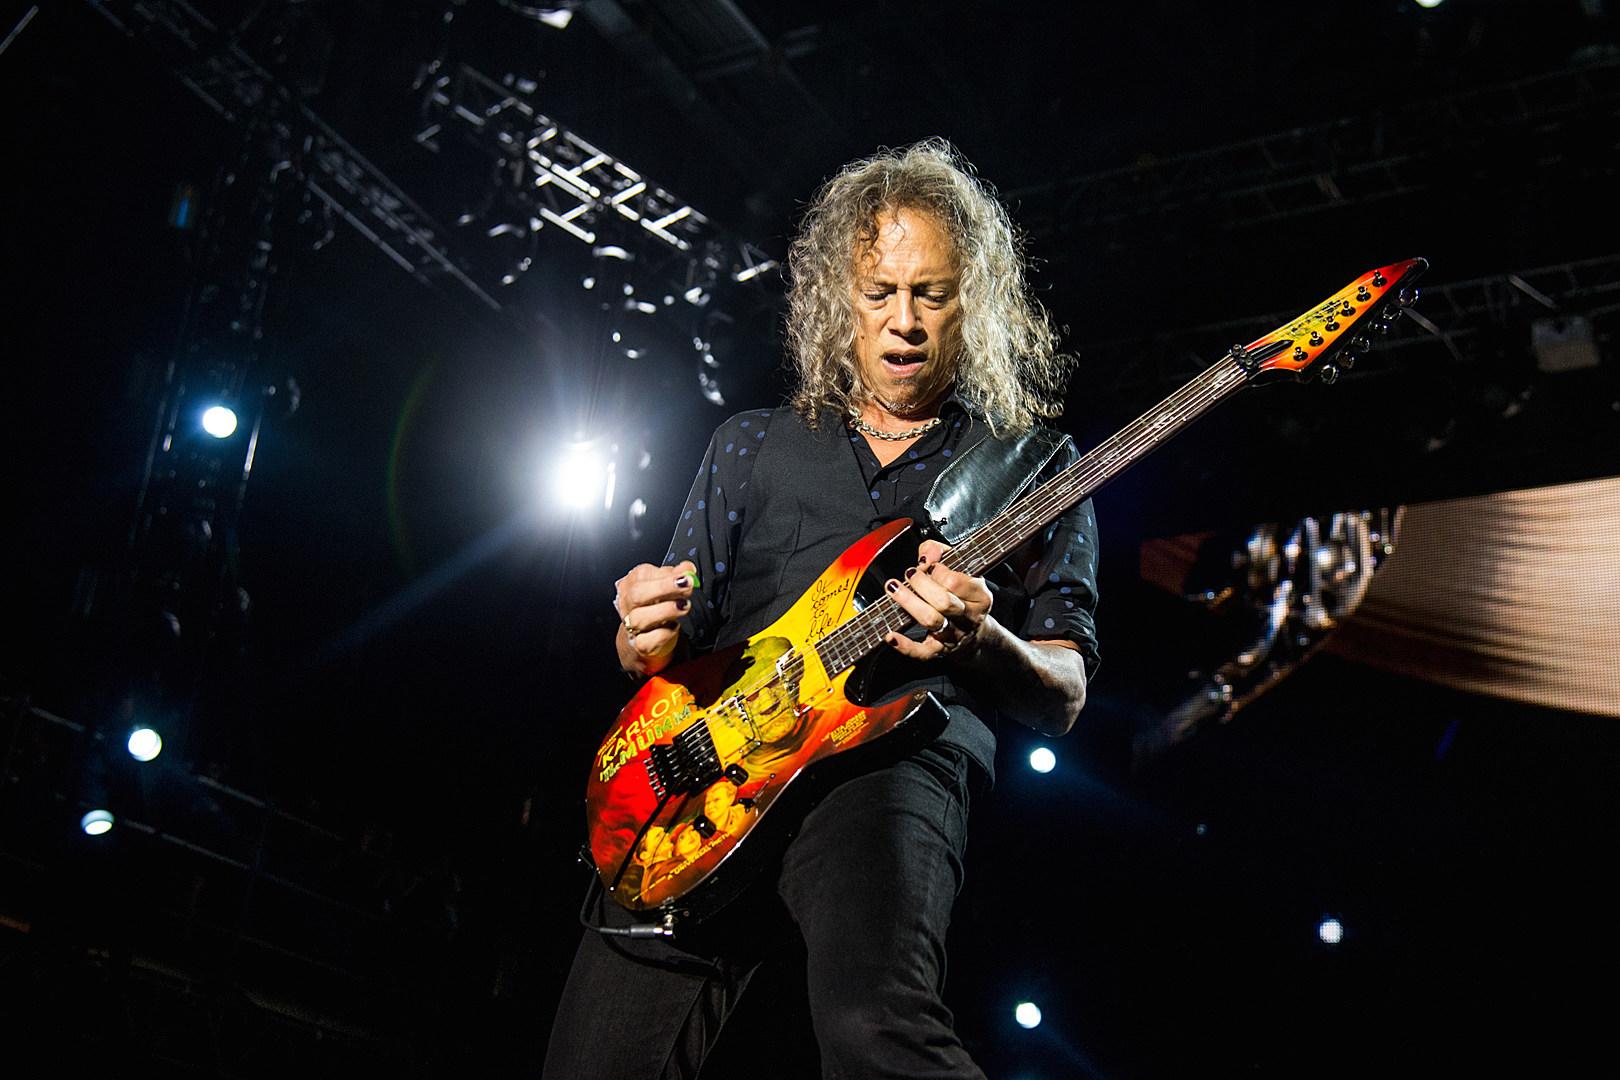 Metallica's Kirk Hammett on Rock Hall Snubs: Maybe They Just Don't F–king Get It